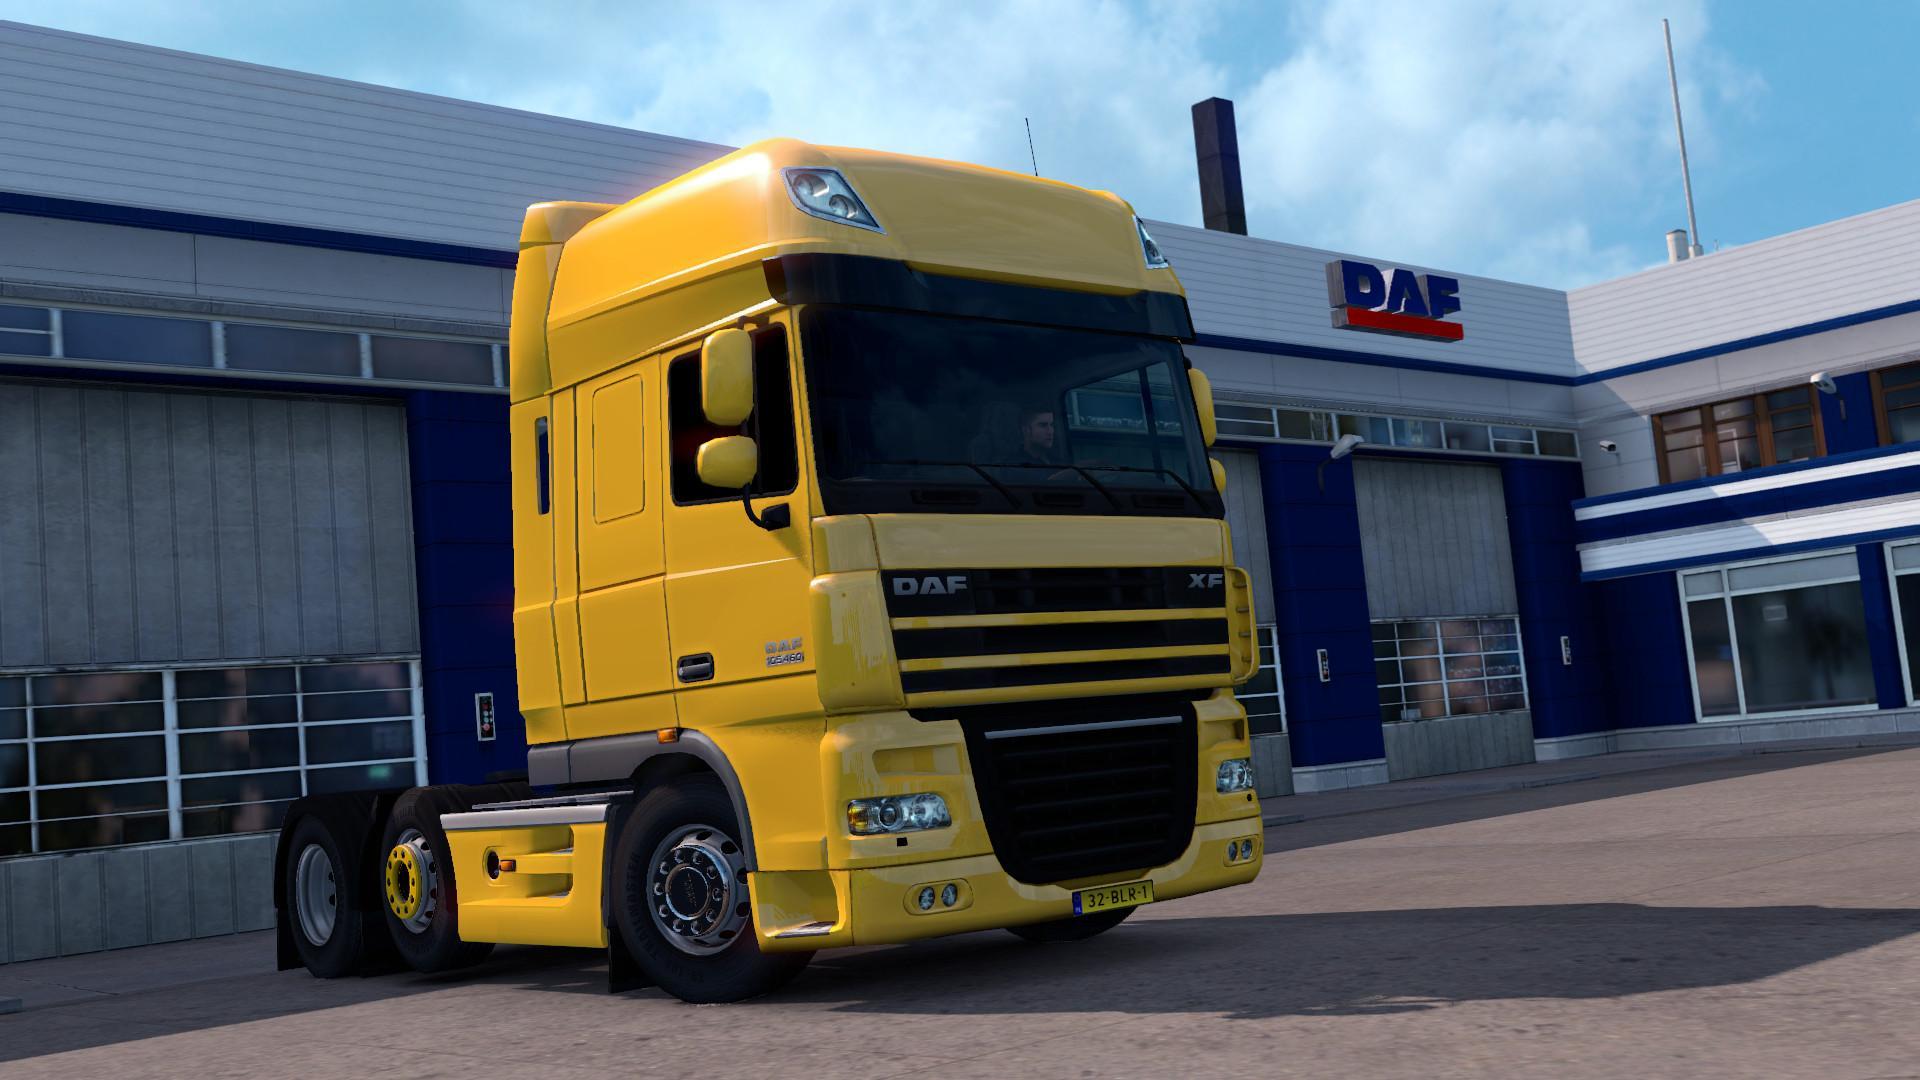 daf xf 105 by 50k for truck euro truck simulator 2 mods. Black Bedroom Furniture Sets. Home Design Ideas